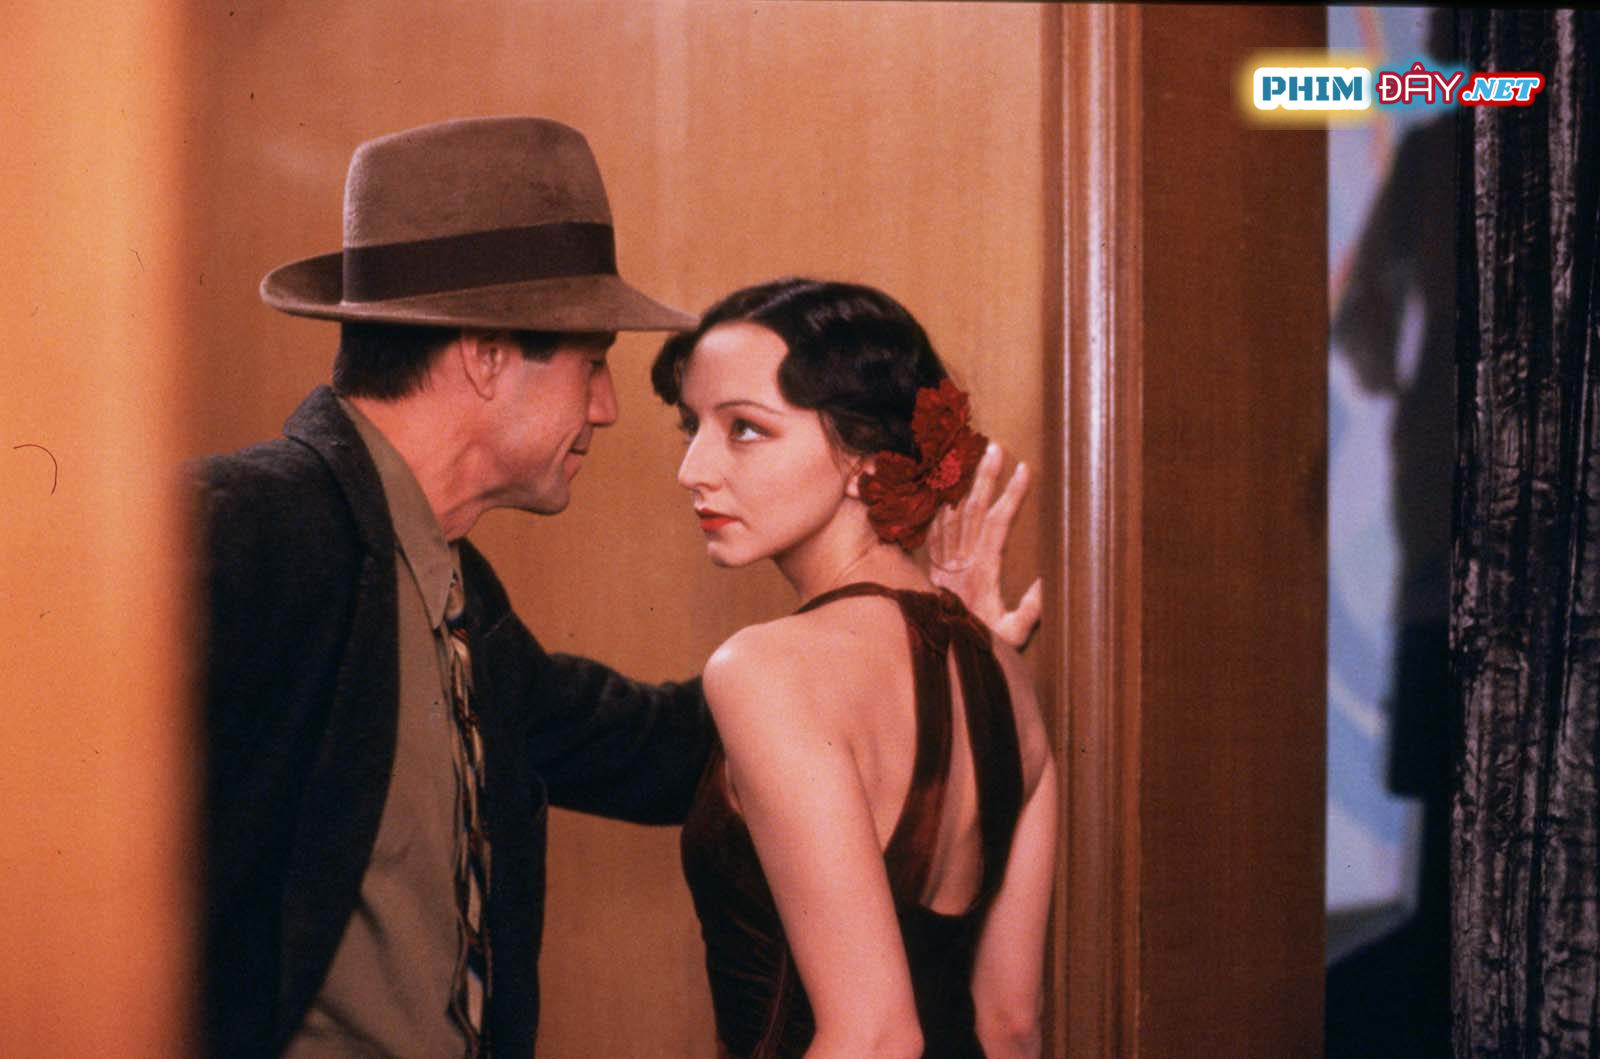 Henry & June (1990)  - Phim 18+ Âu Mỹ